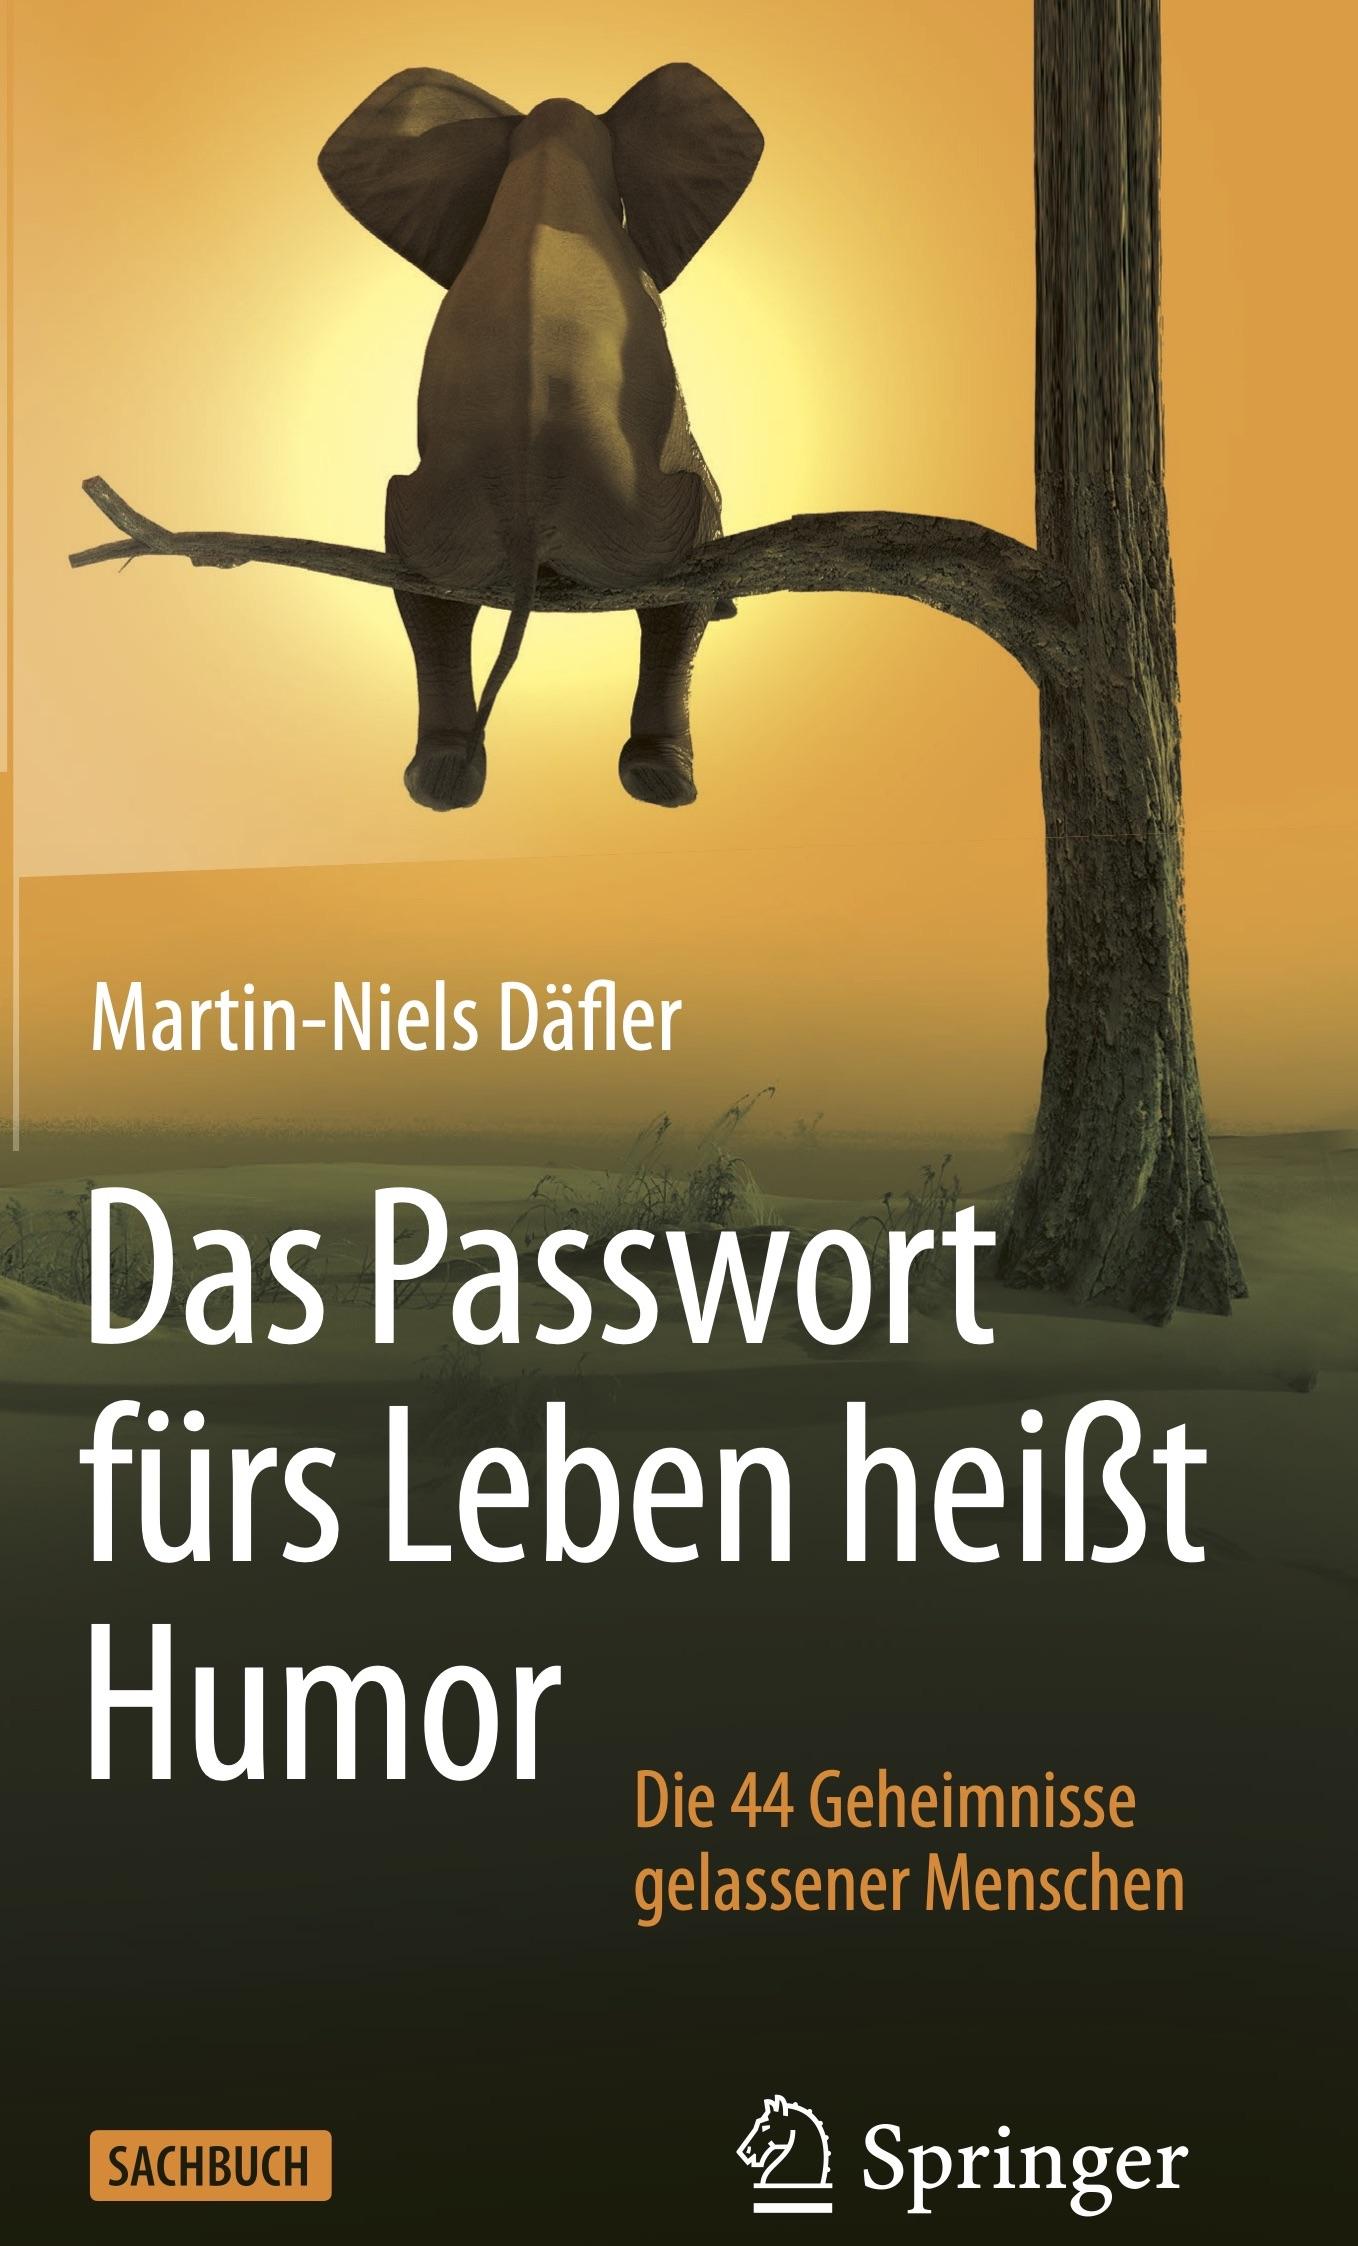 Däfler_Humor_2A_Cover